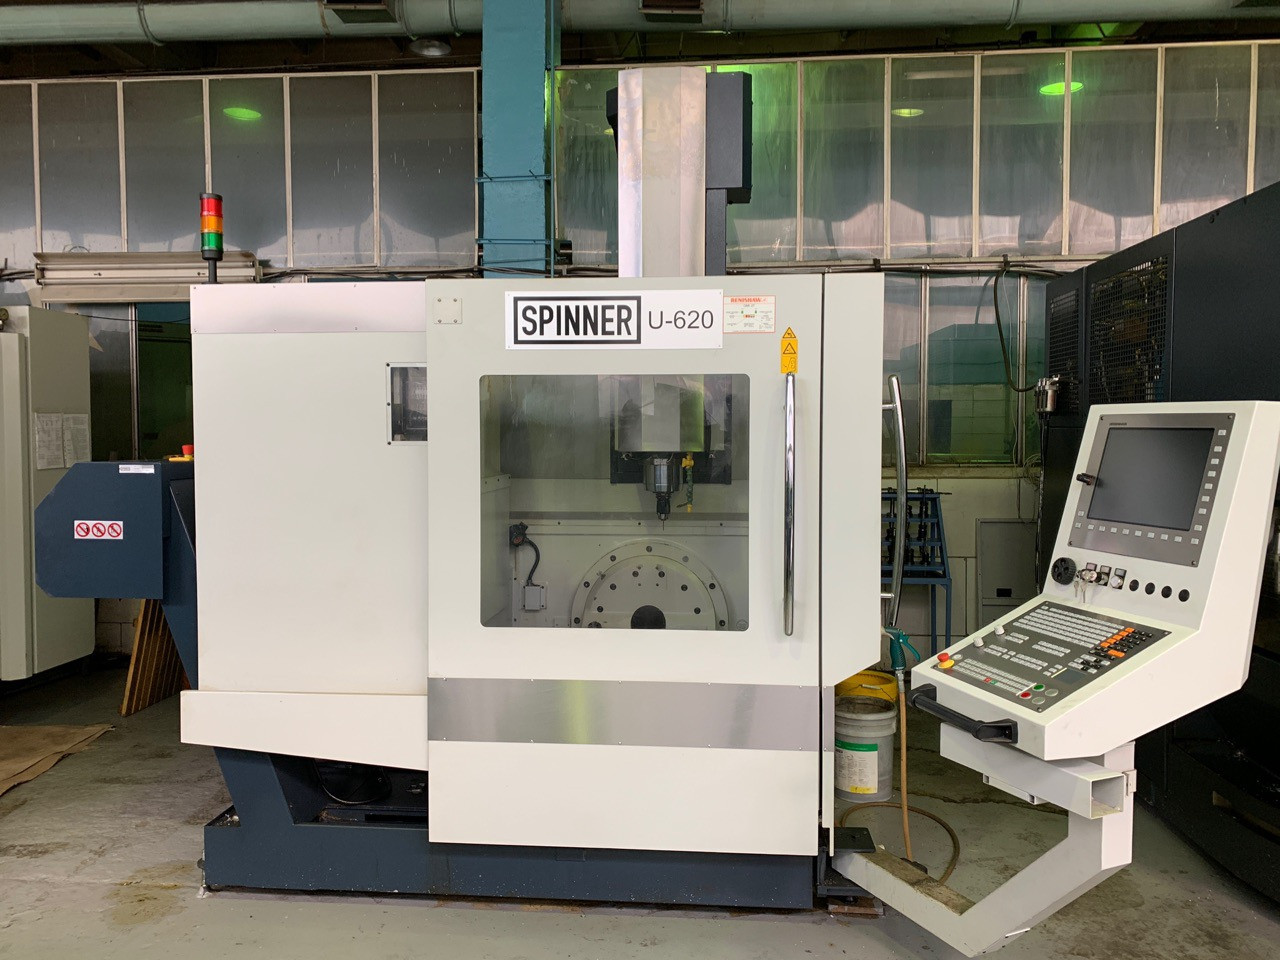 Spinner U5-620